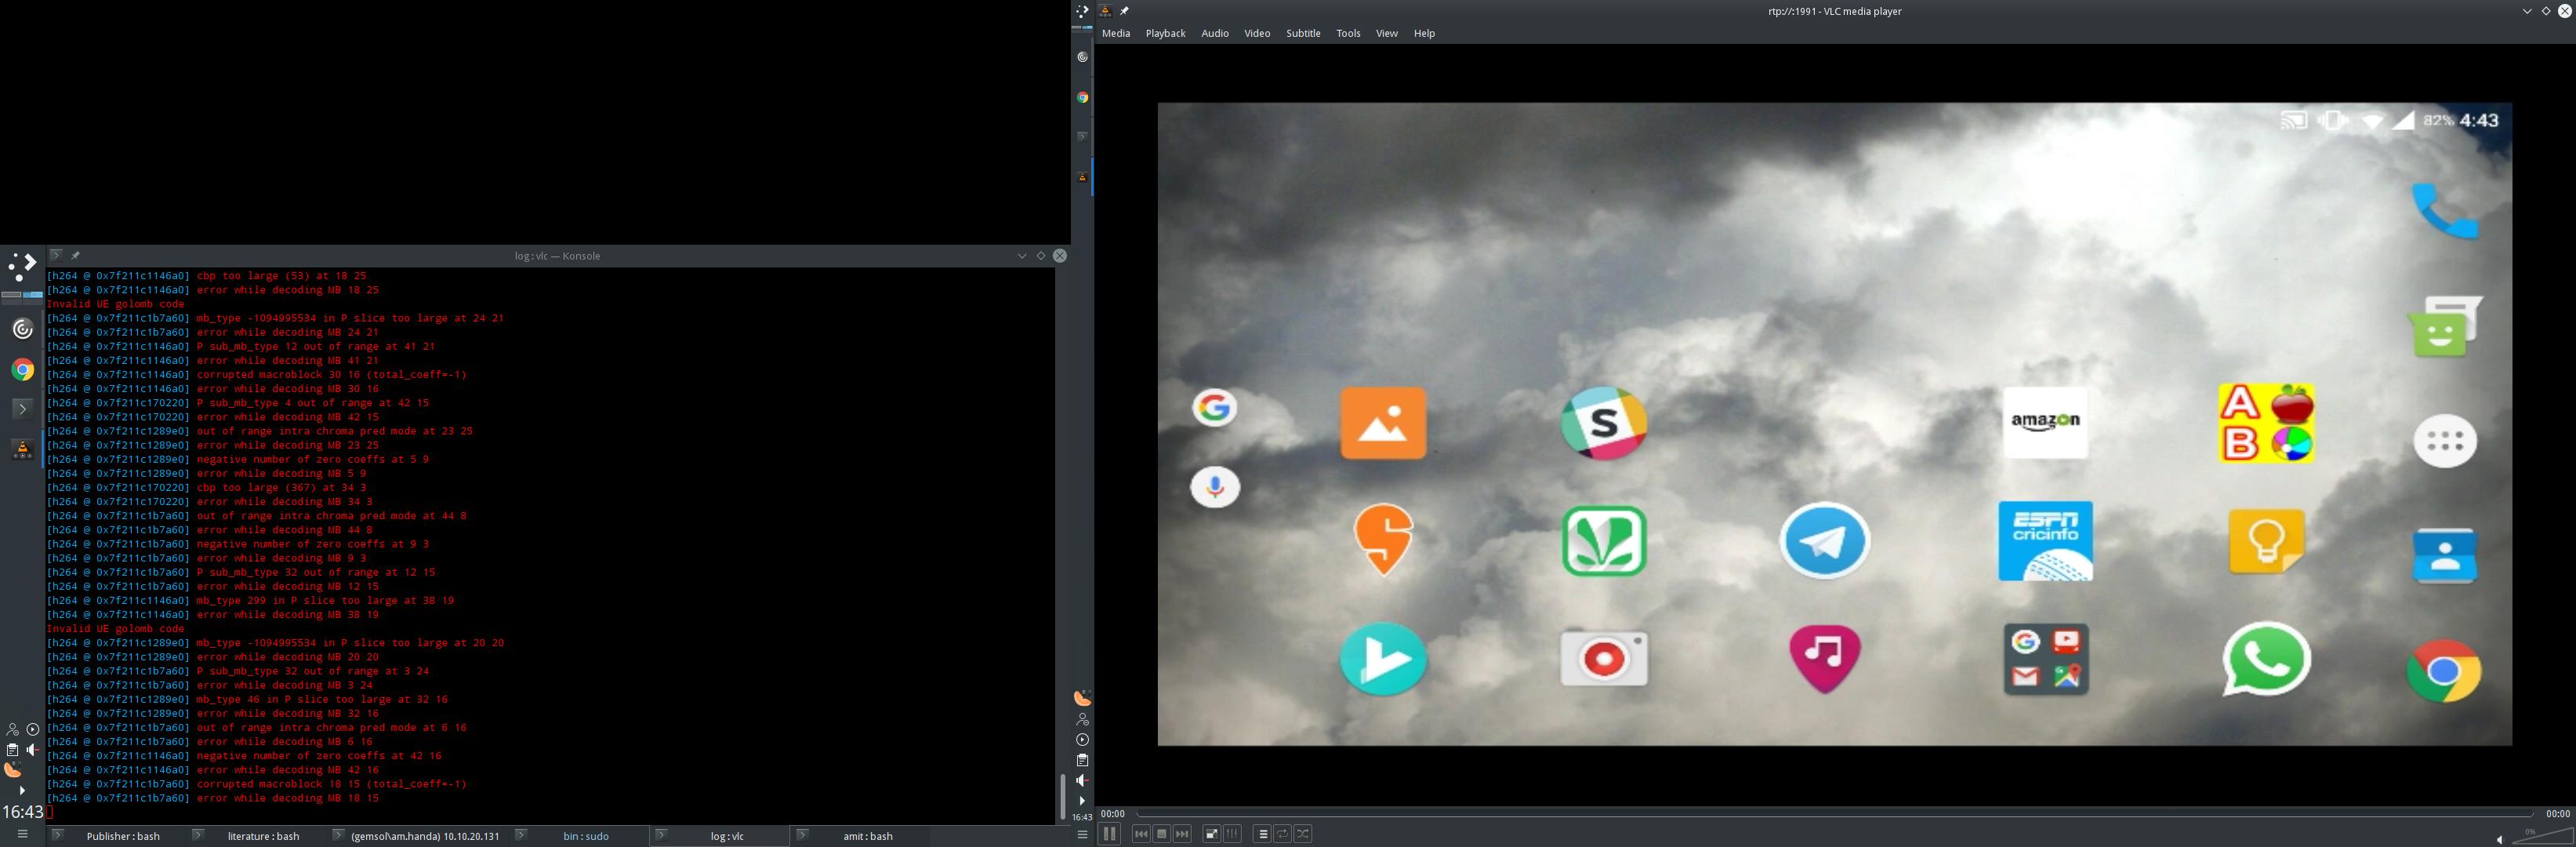 unable to run in ubuntu 17 04 · Issue #224 · albfan